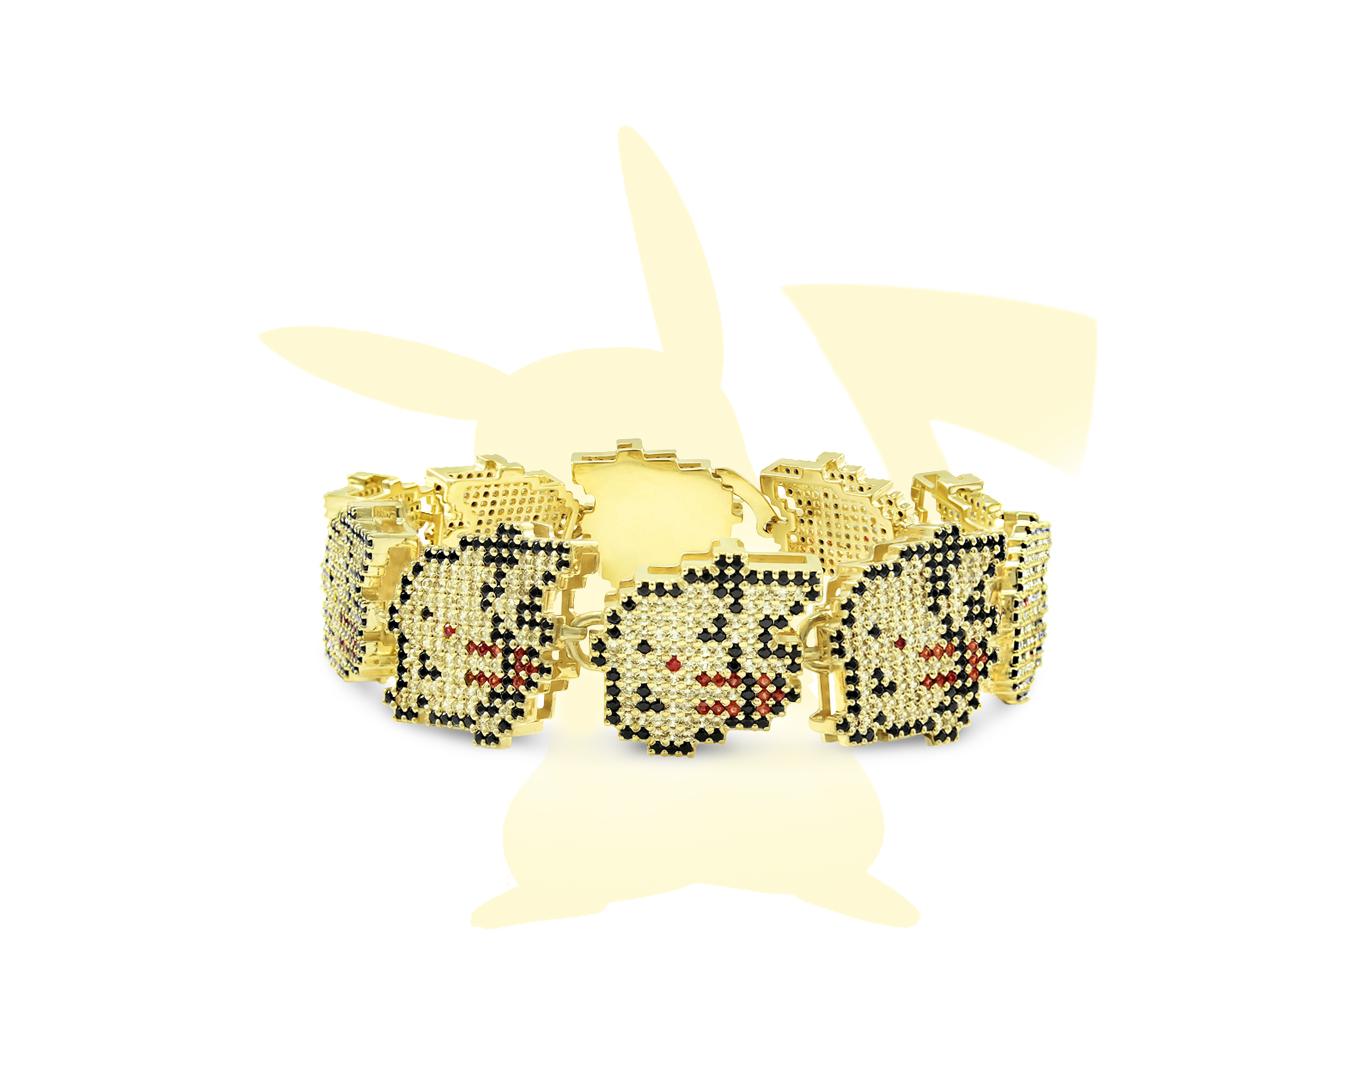 pikachu-bracelet-featured-image.jpg